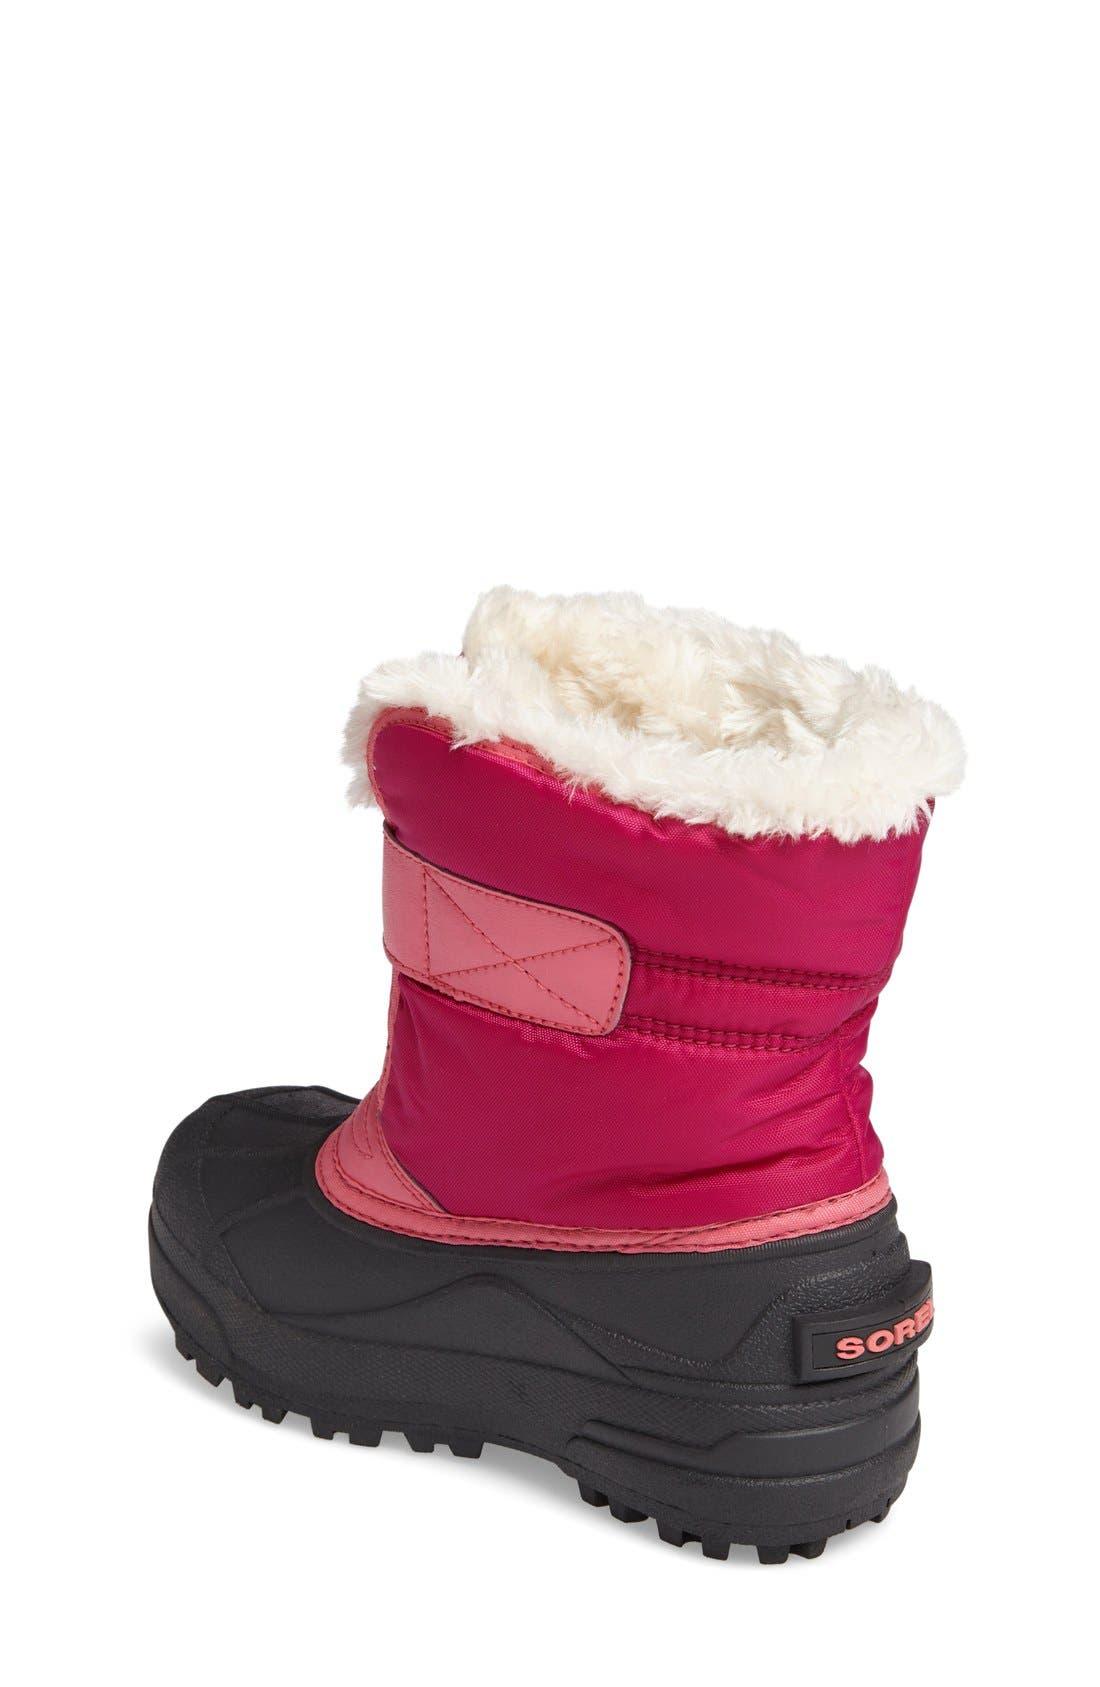 'Snow Commander' Boot,                             Alternate thumbnail 2, color,                             Tropic Pink/ Deep Blush